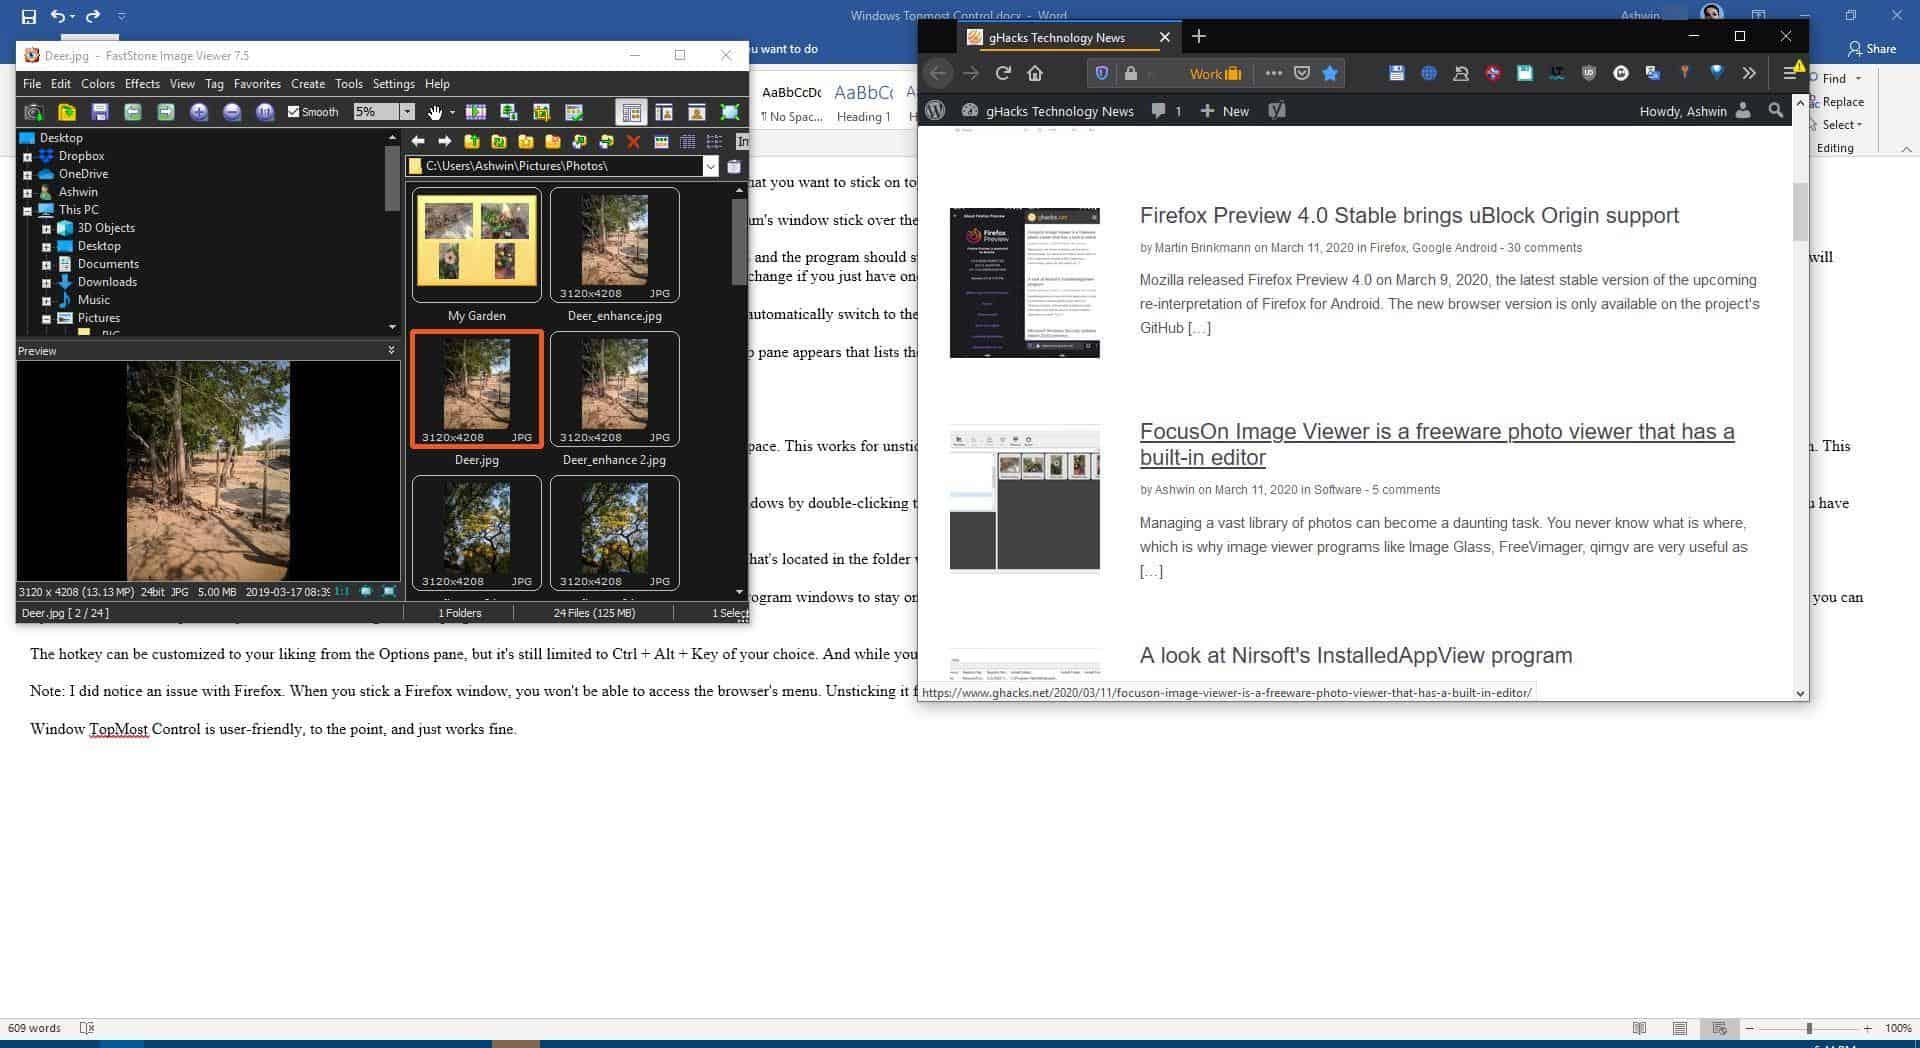 Windows Topmost Control example